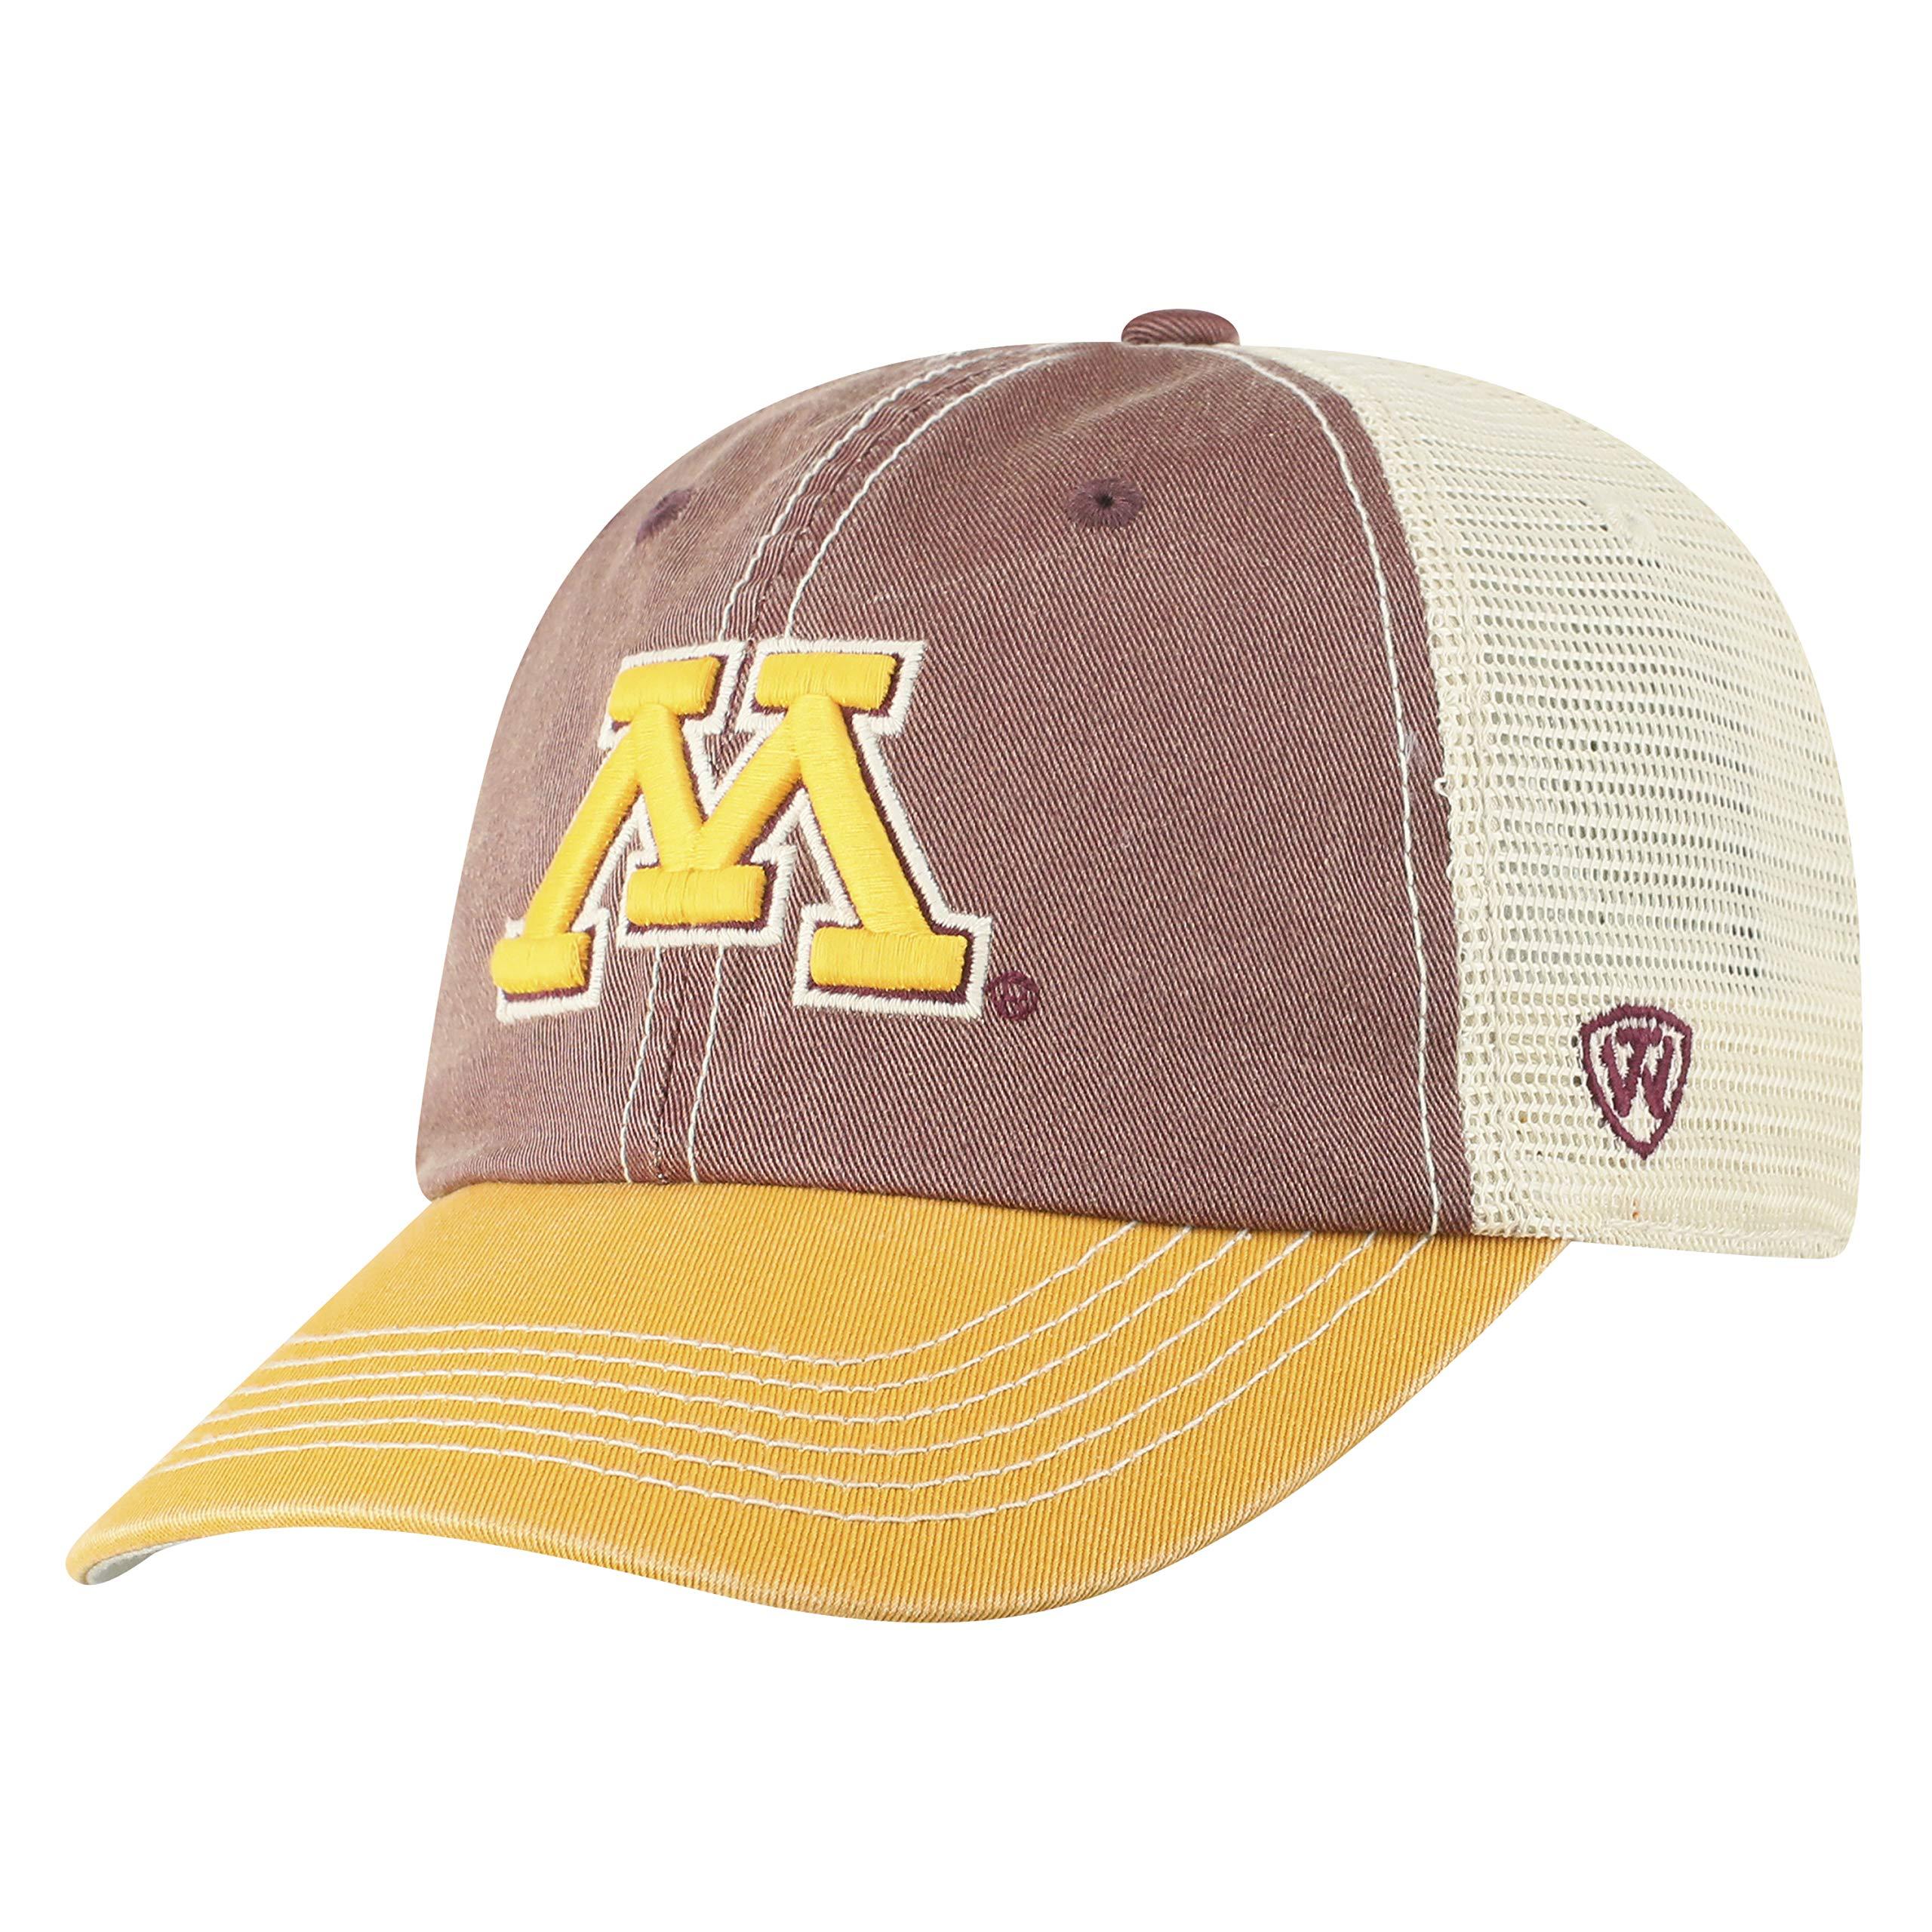 Top of the World NCAA Minnesota Golden Gophers Offroad Snapback Mesh Back Adjustable Hat, One Size, Maroon/Gold/Khaki